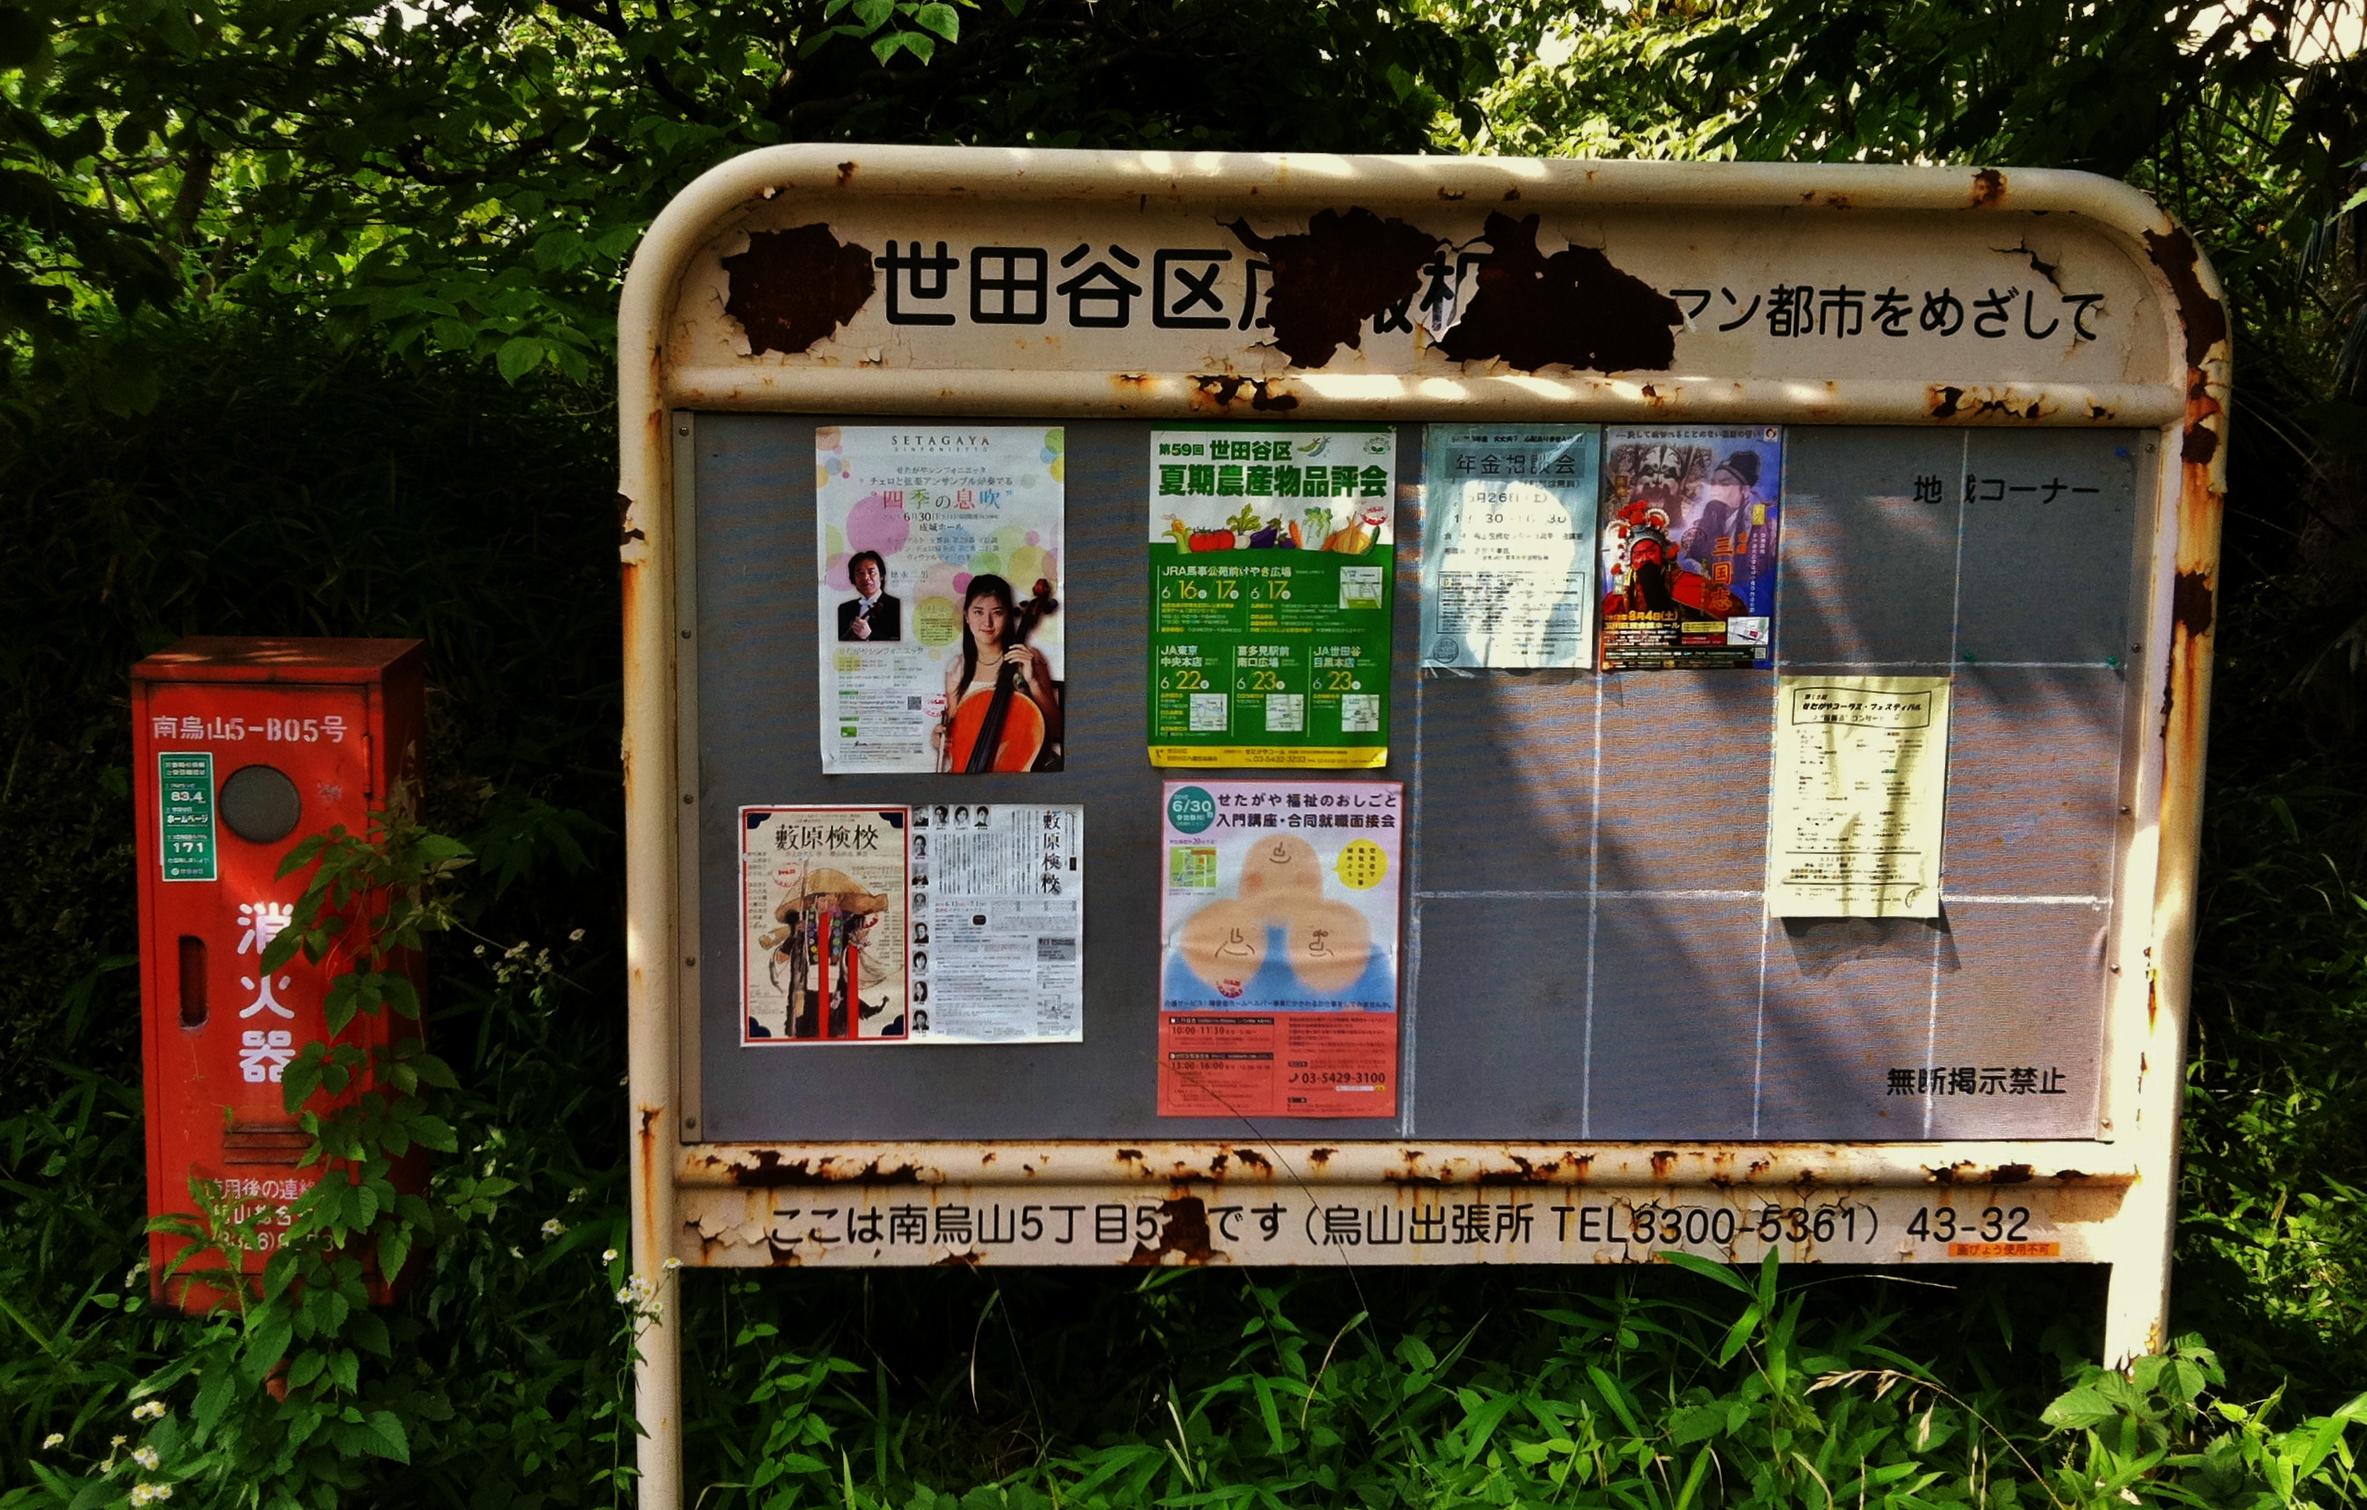 (32) Community bulletin boards 町内会用屋外掲示板